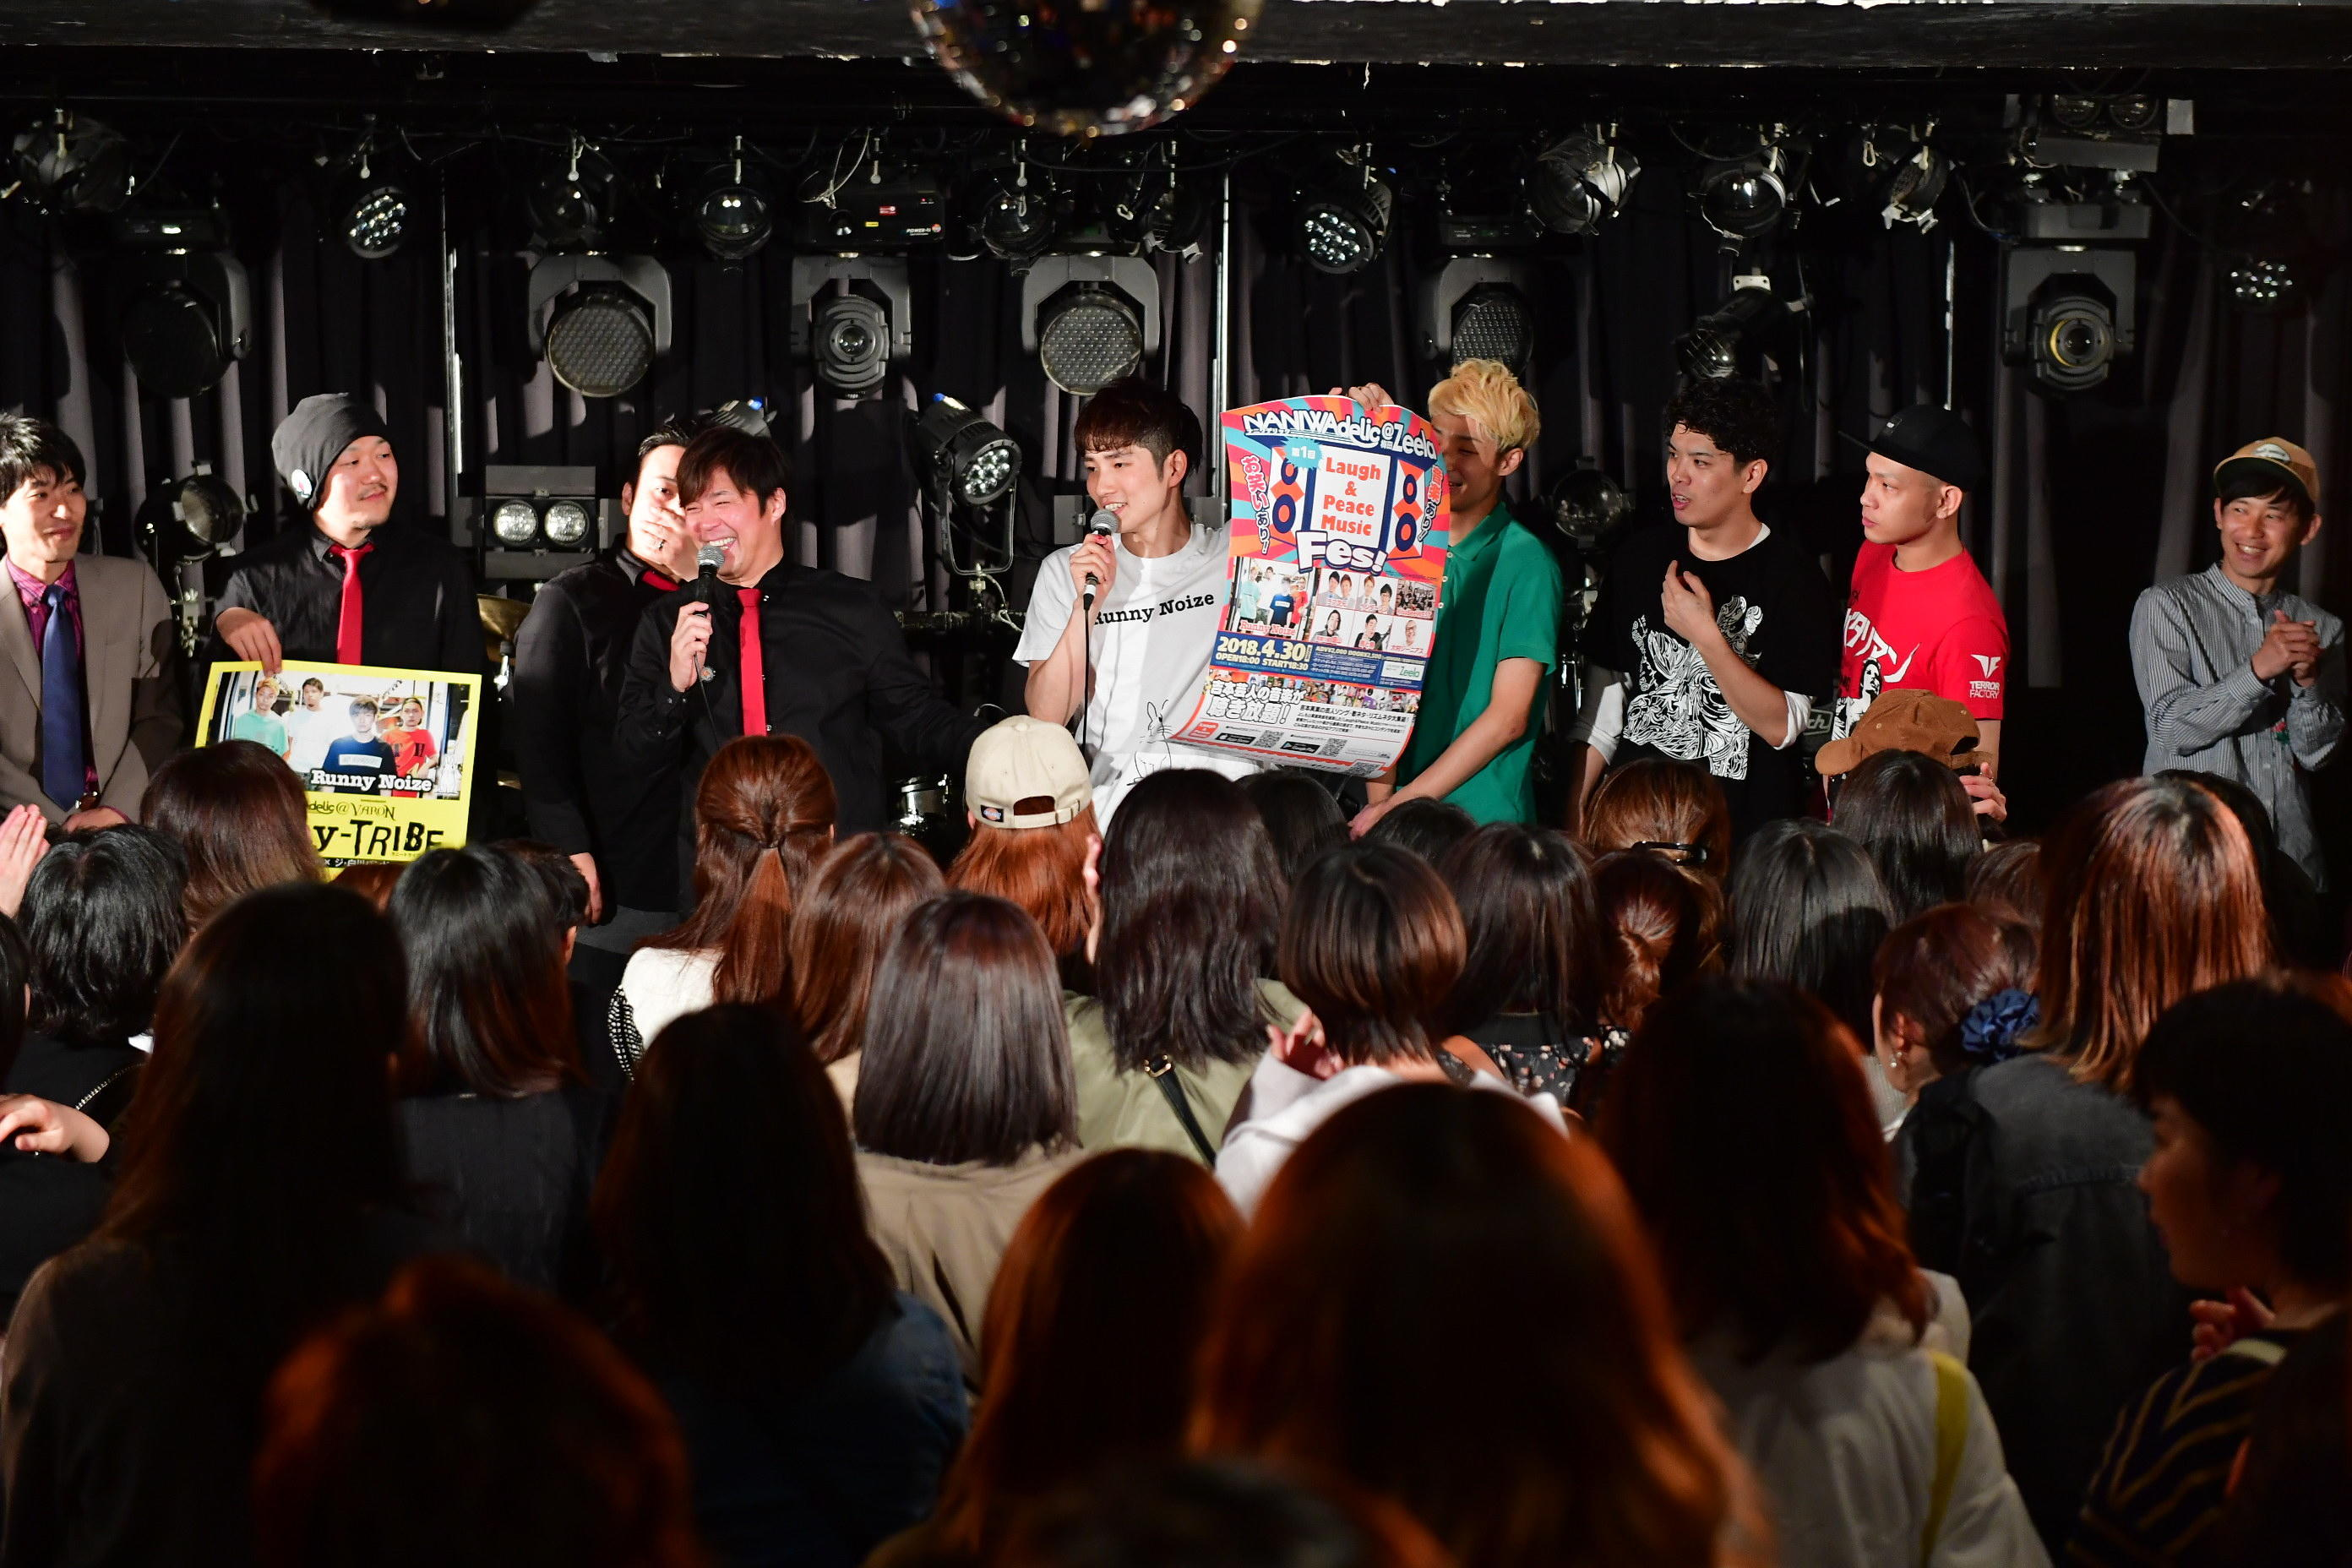 http://news.yoshimoto.co.jp/20180331130545-7ffcbeedf62b7d0d9c5043dc86c0d3330d1f9869.jpg